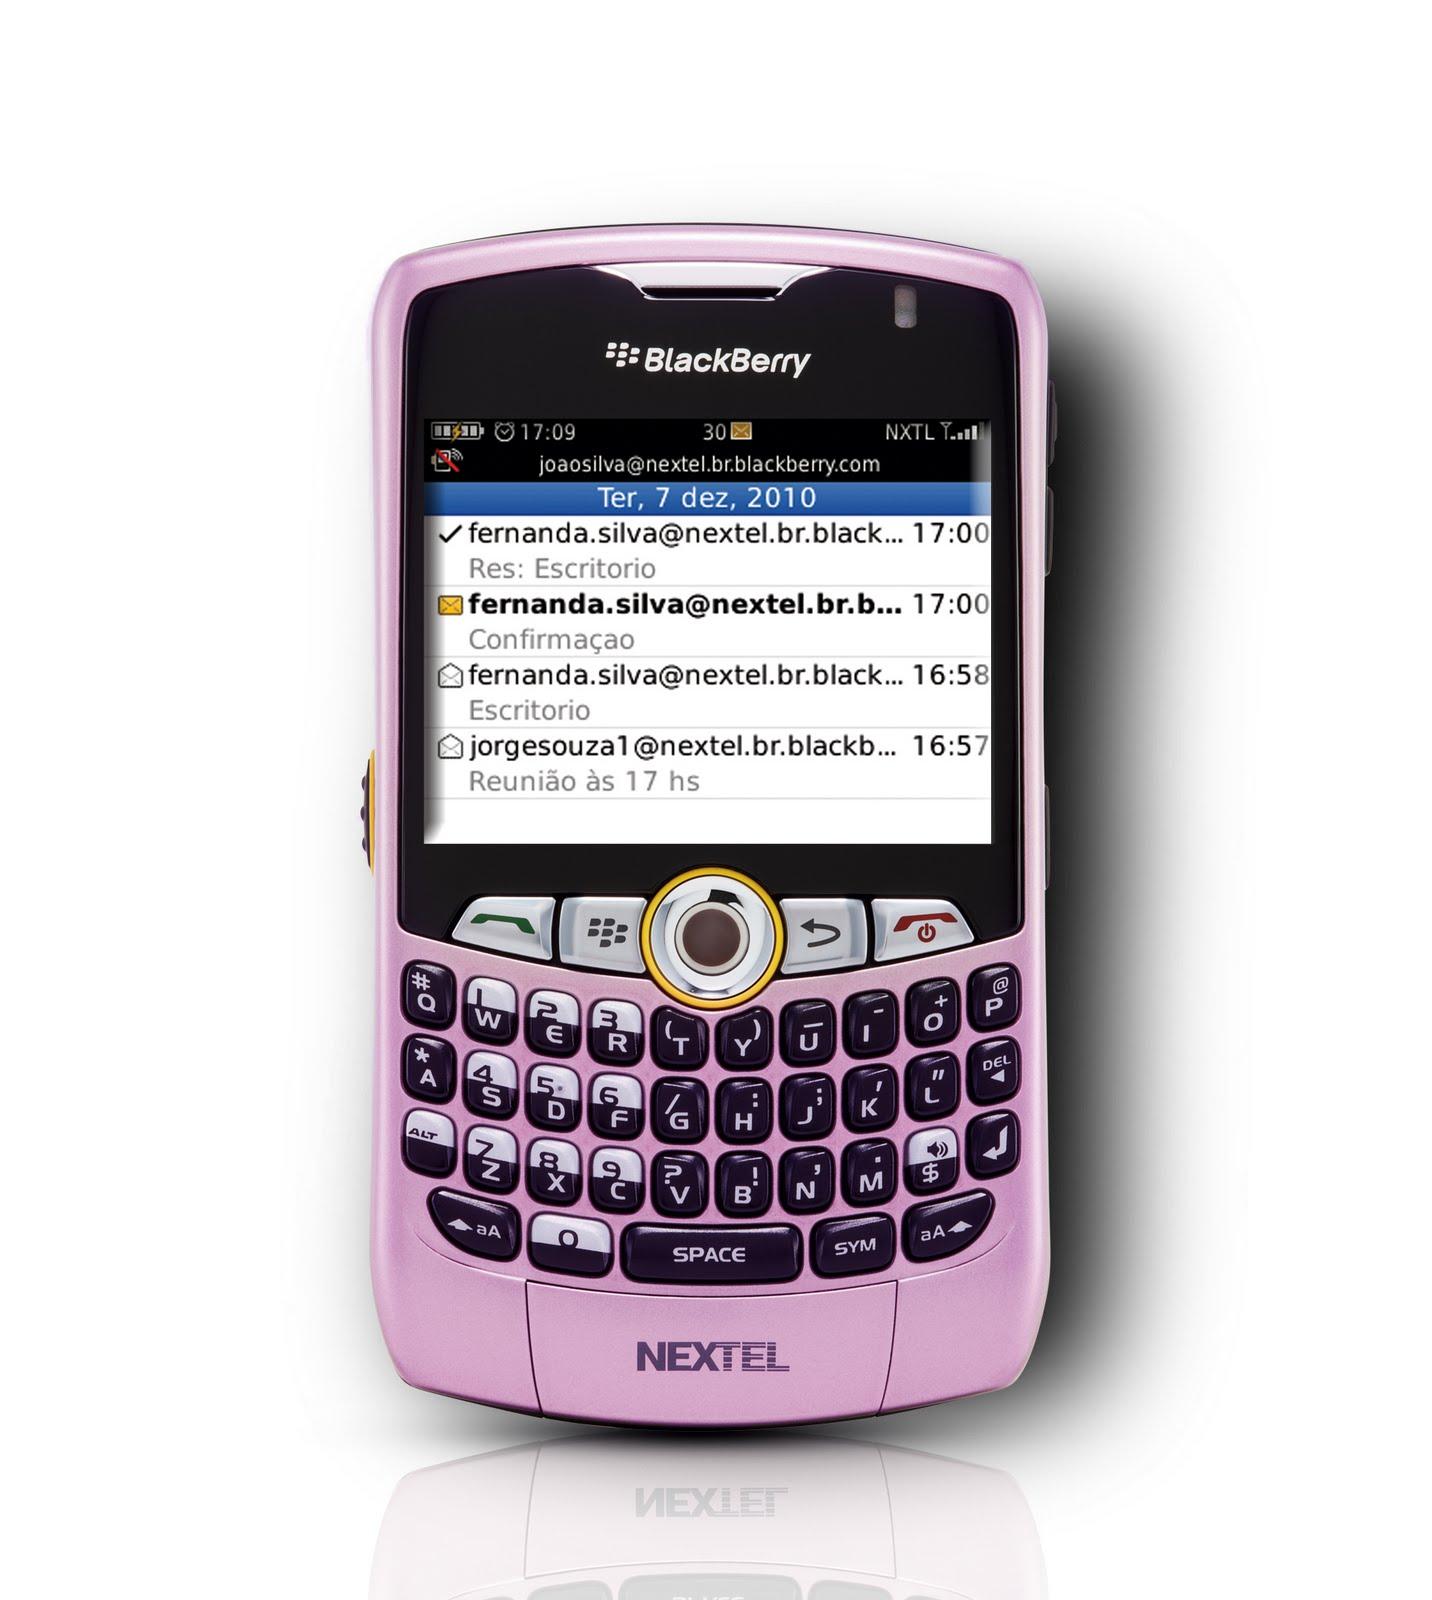 http://1.bp.blogspot.com/-XT-15pfvP58/TkGmZgLWV9I/AAAAAAAAPNk/YOxothGStog/s1600/BlackBerry_Curve_8350i_Pink.jpg